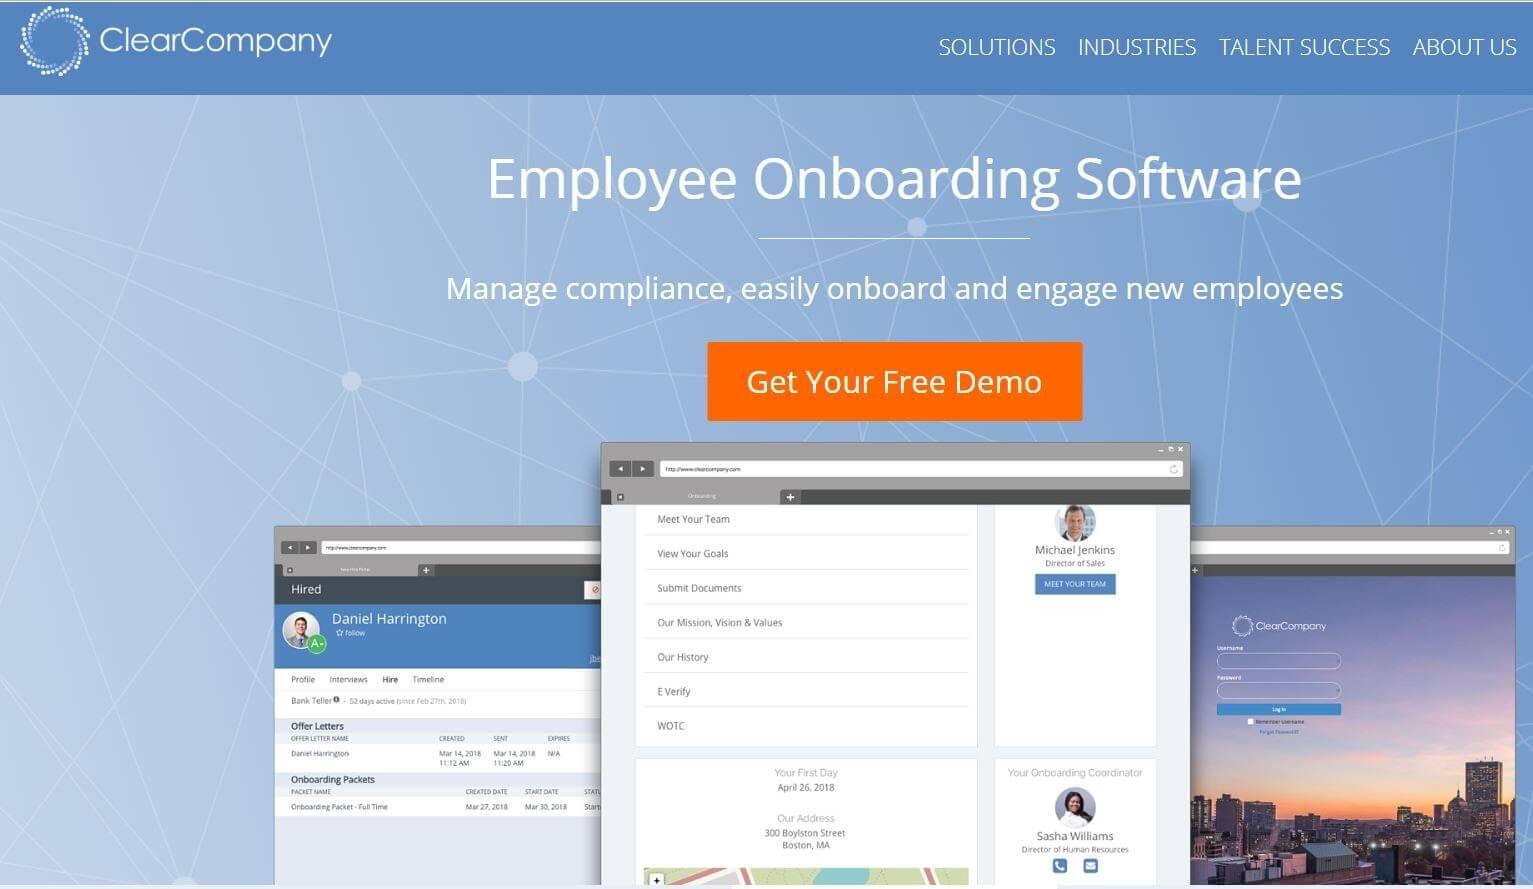 ClearCompany Employee Onboarding Tool